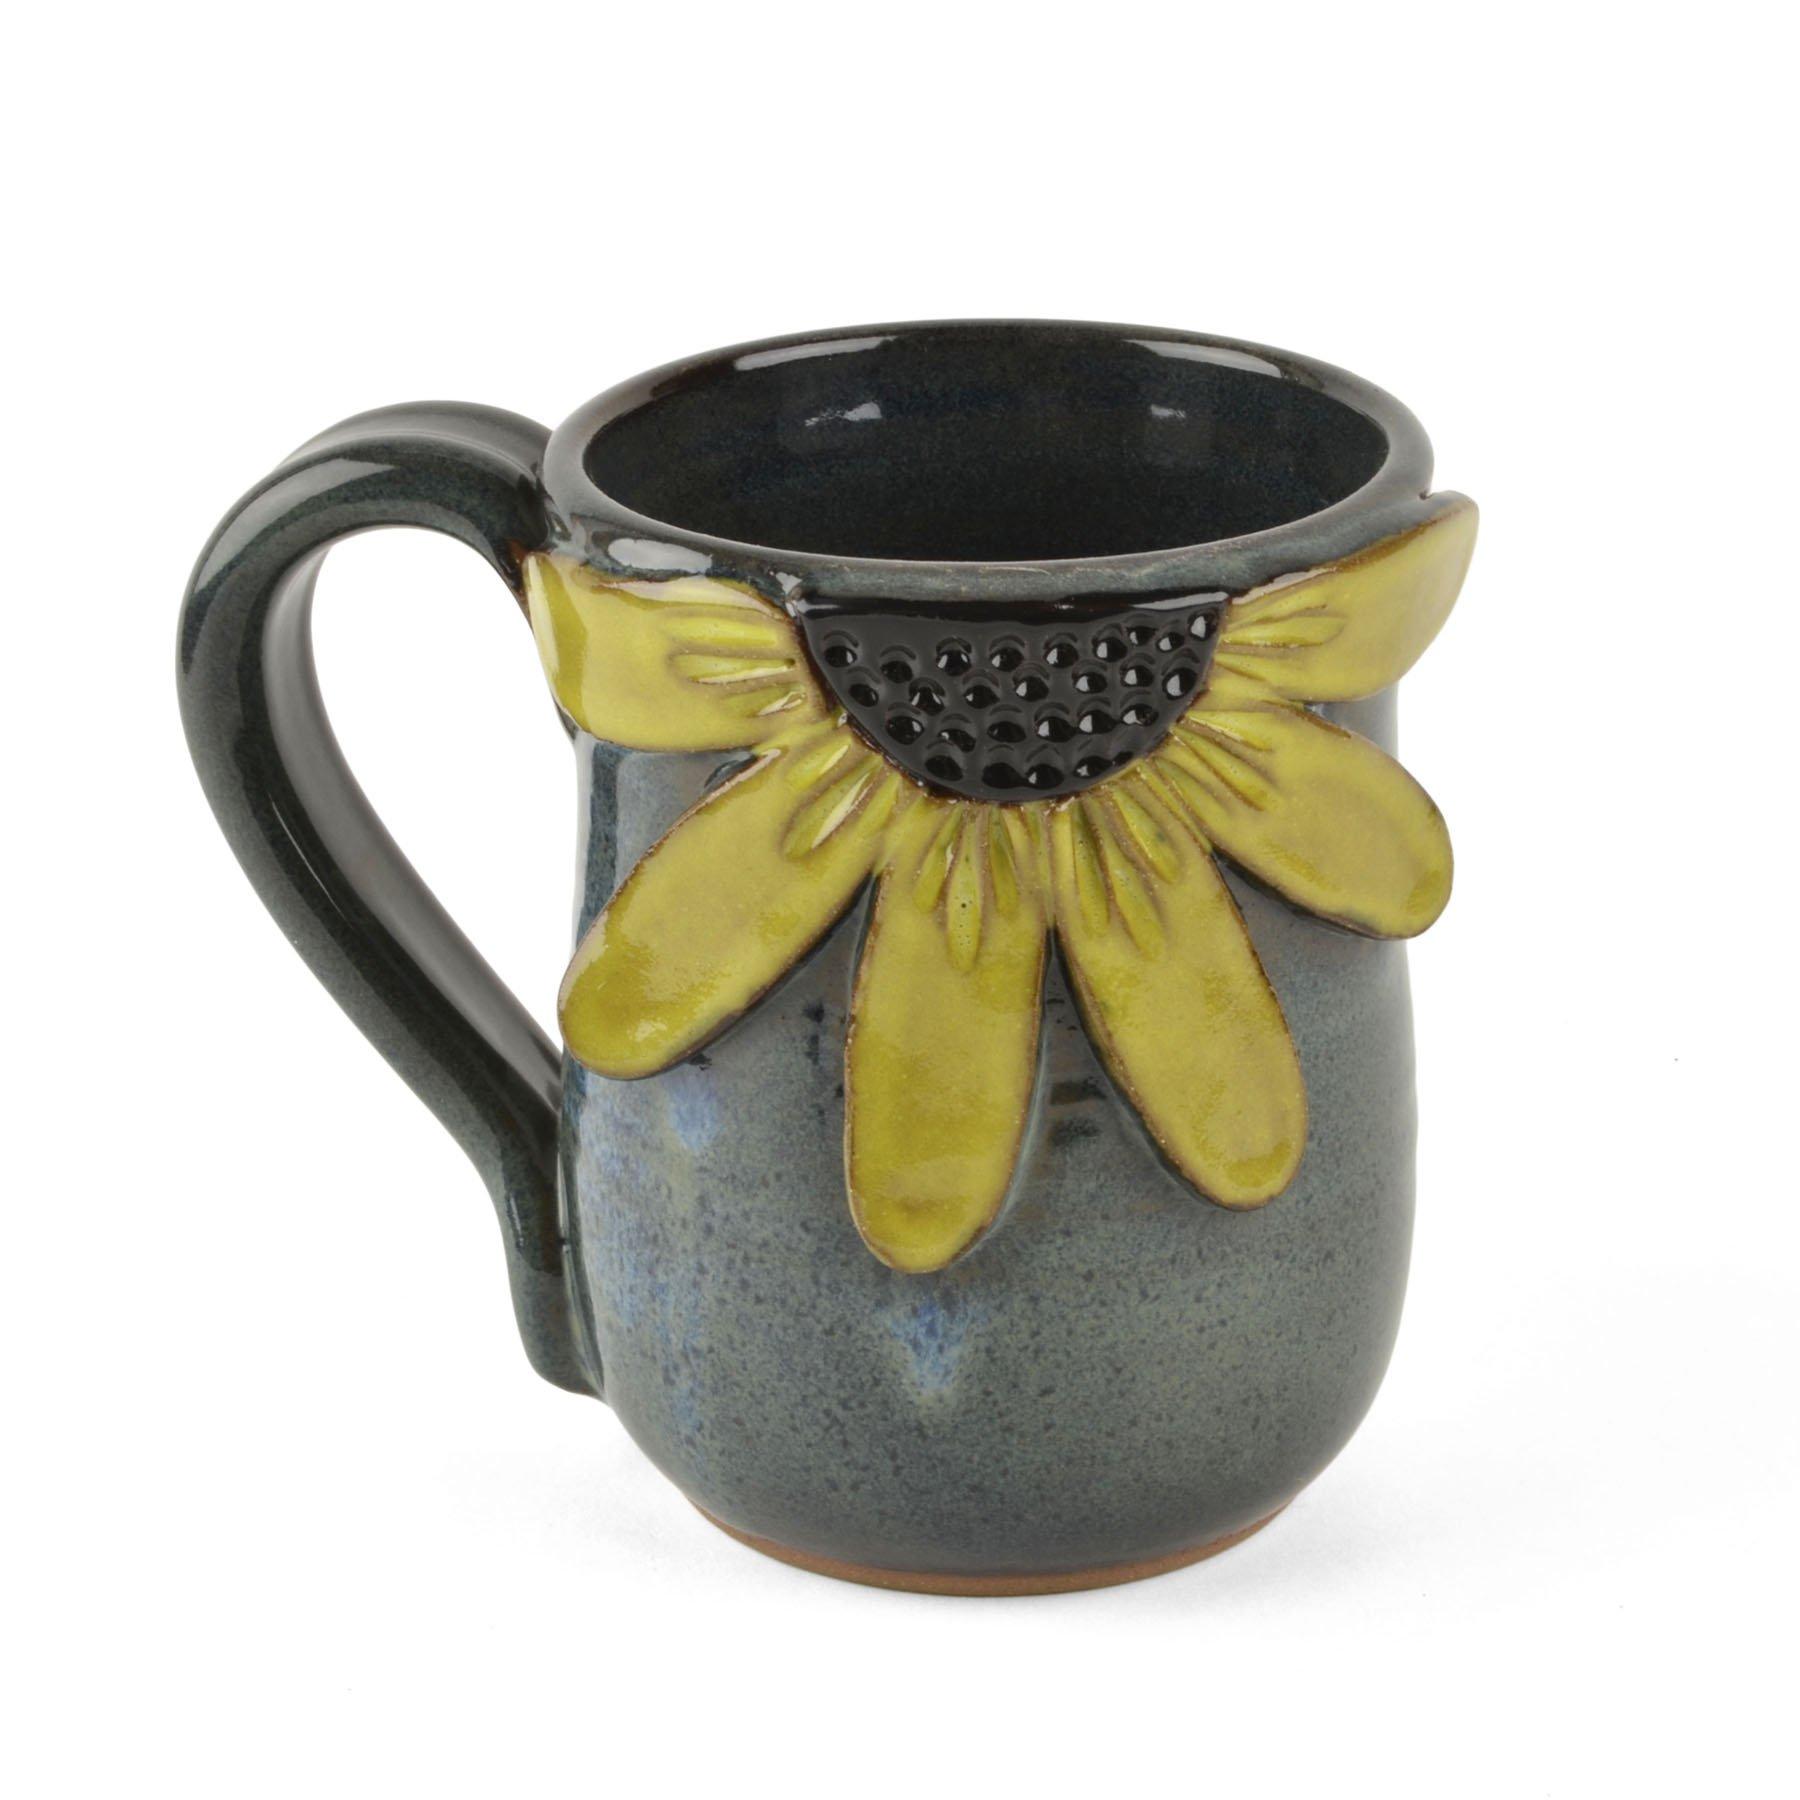 MudWorks Pottery Black-Eyed Susan Mug by MudWorks Pottery